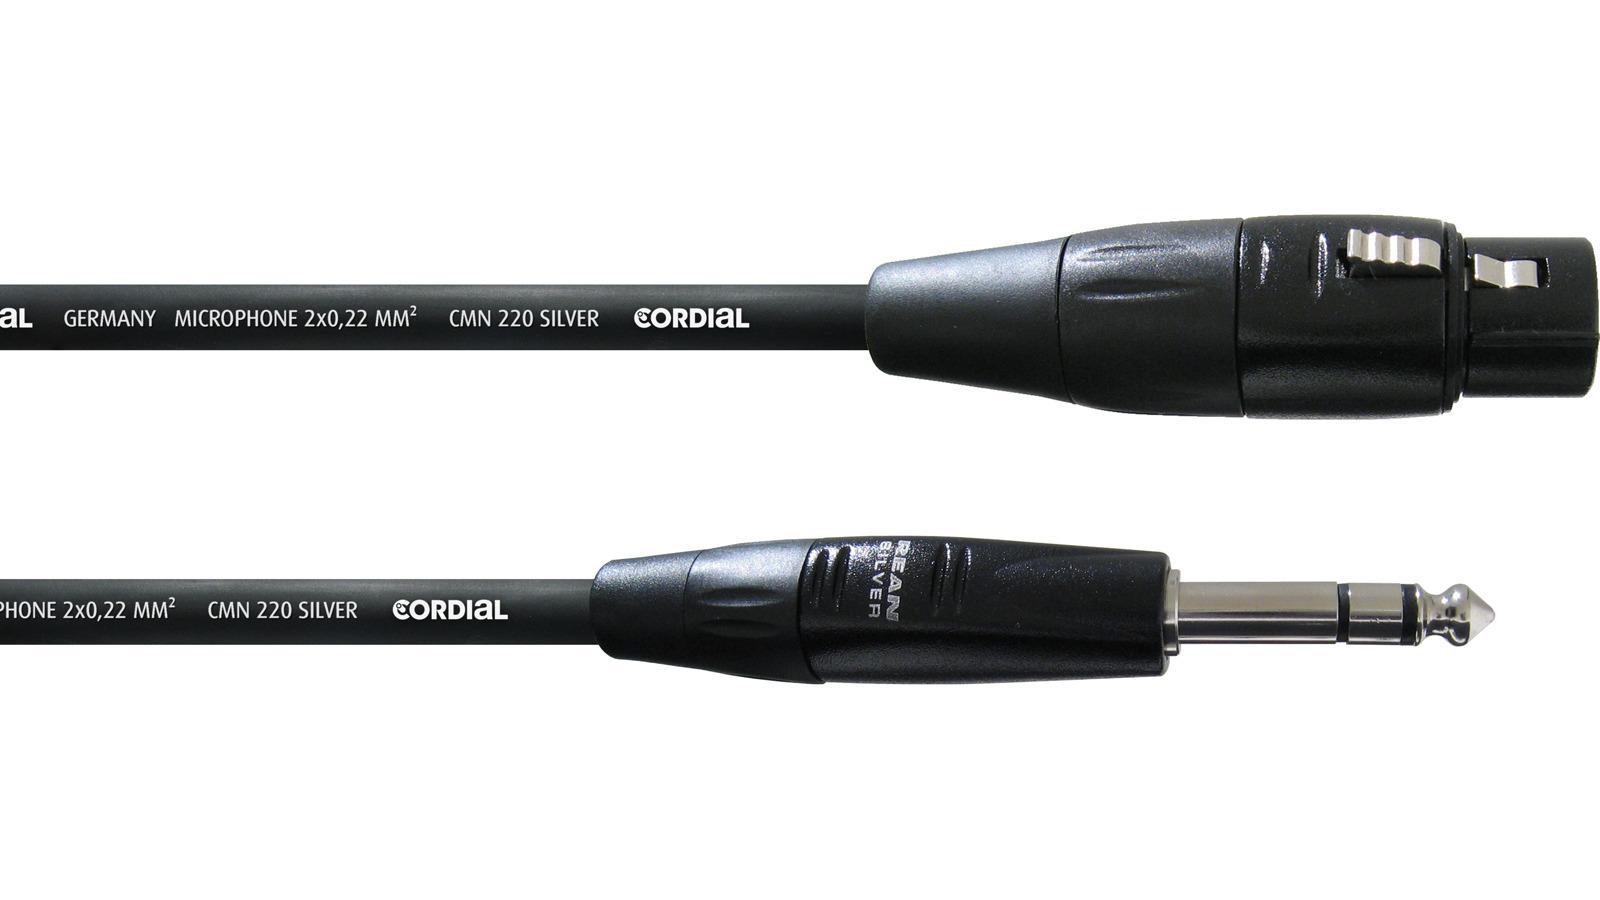 Cordial symmetrisches Klinke XLR female Mikrofonkabel 6 m CIM6FV